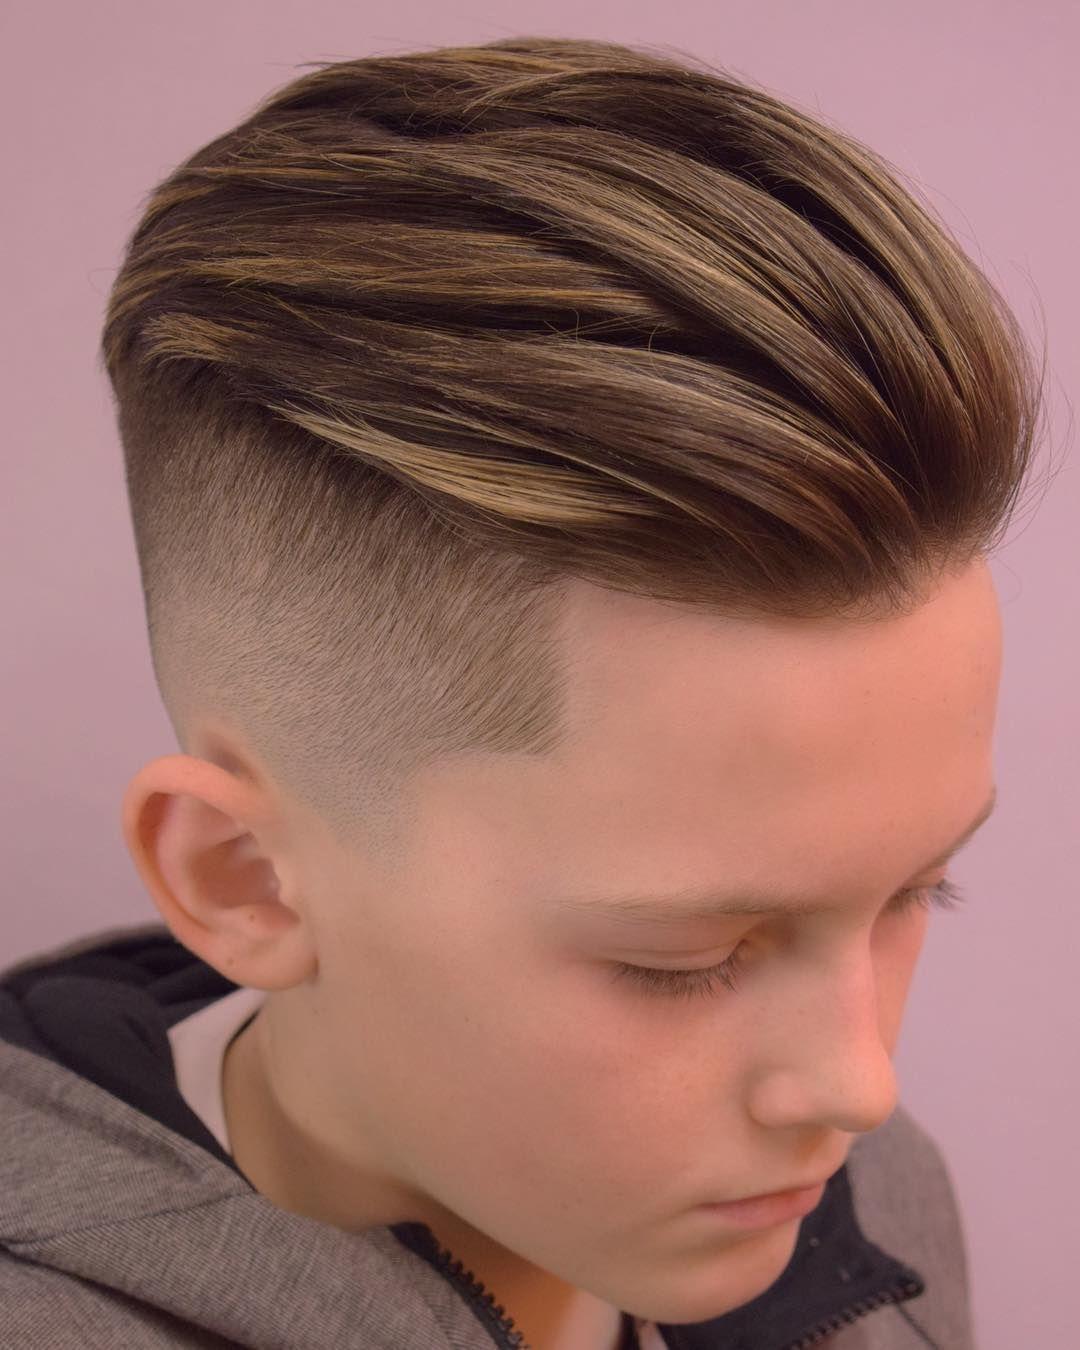 √ cute kids hairstyle braids and haircuts for boys 2018 | hair